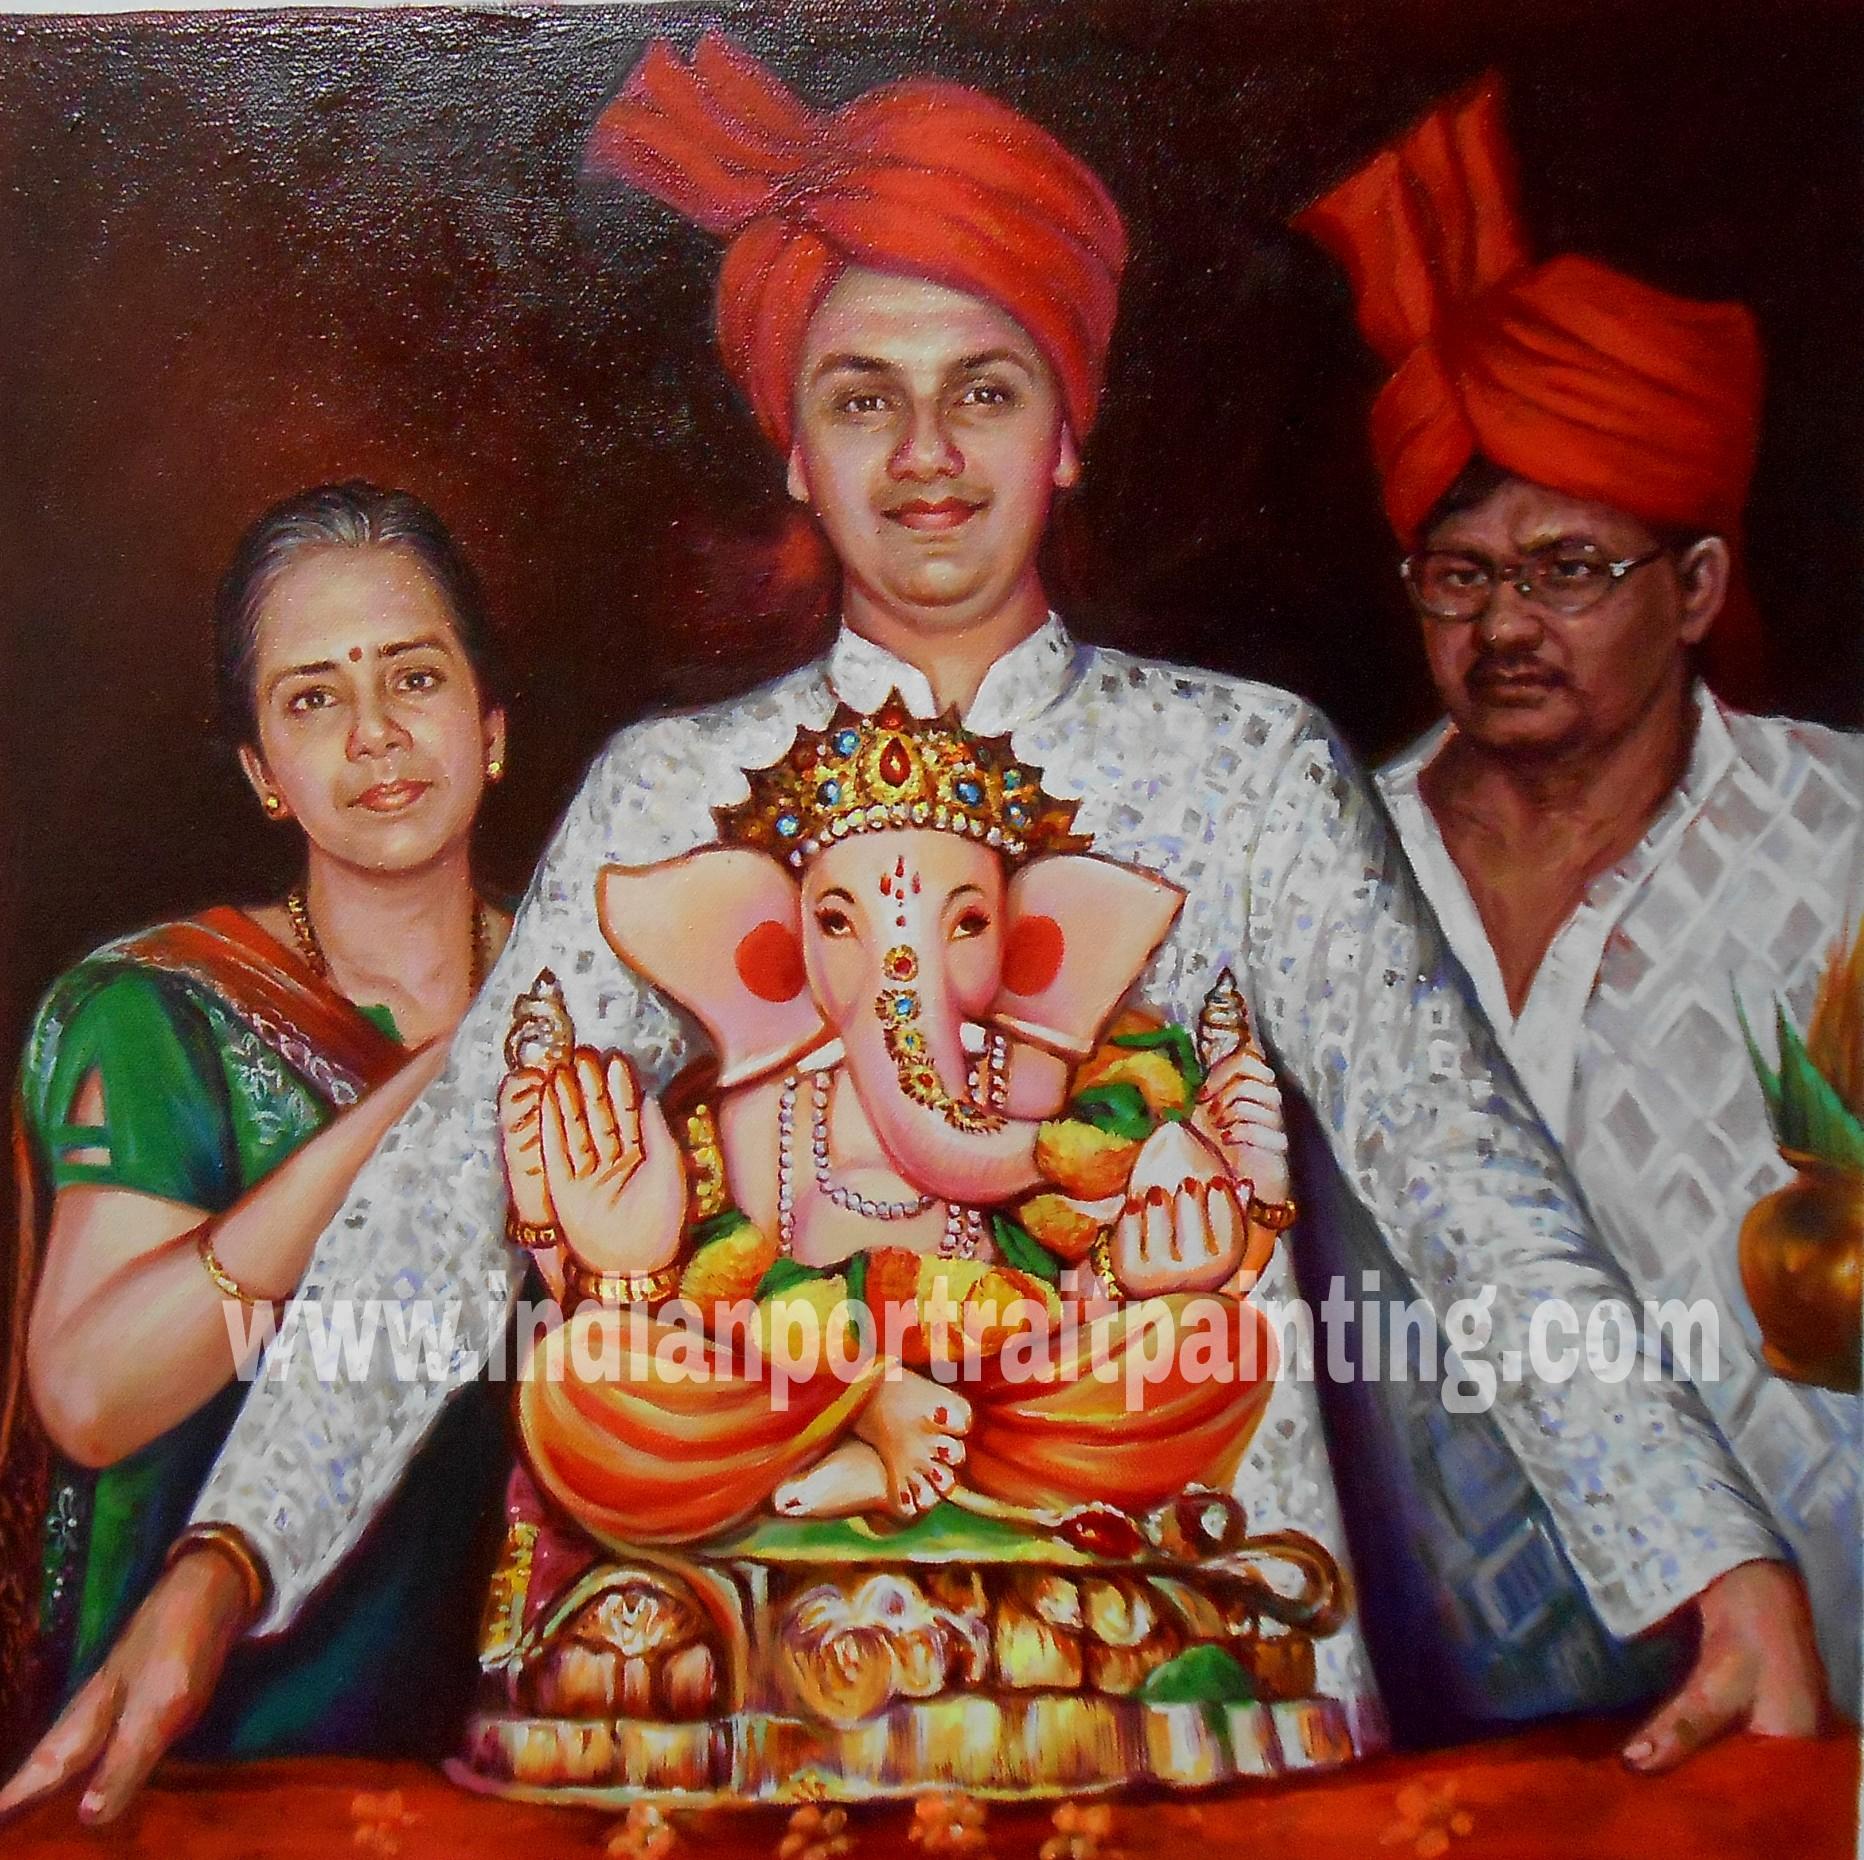 Indian traditional and custom portraits hand painted mumbai